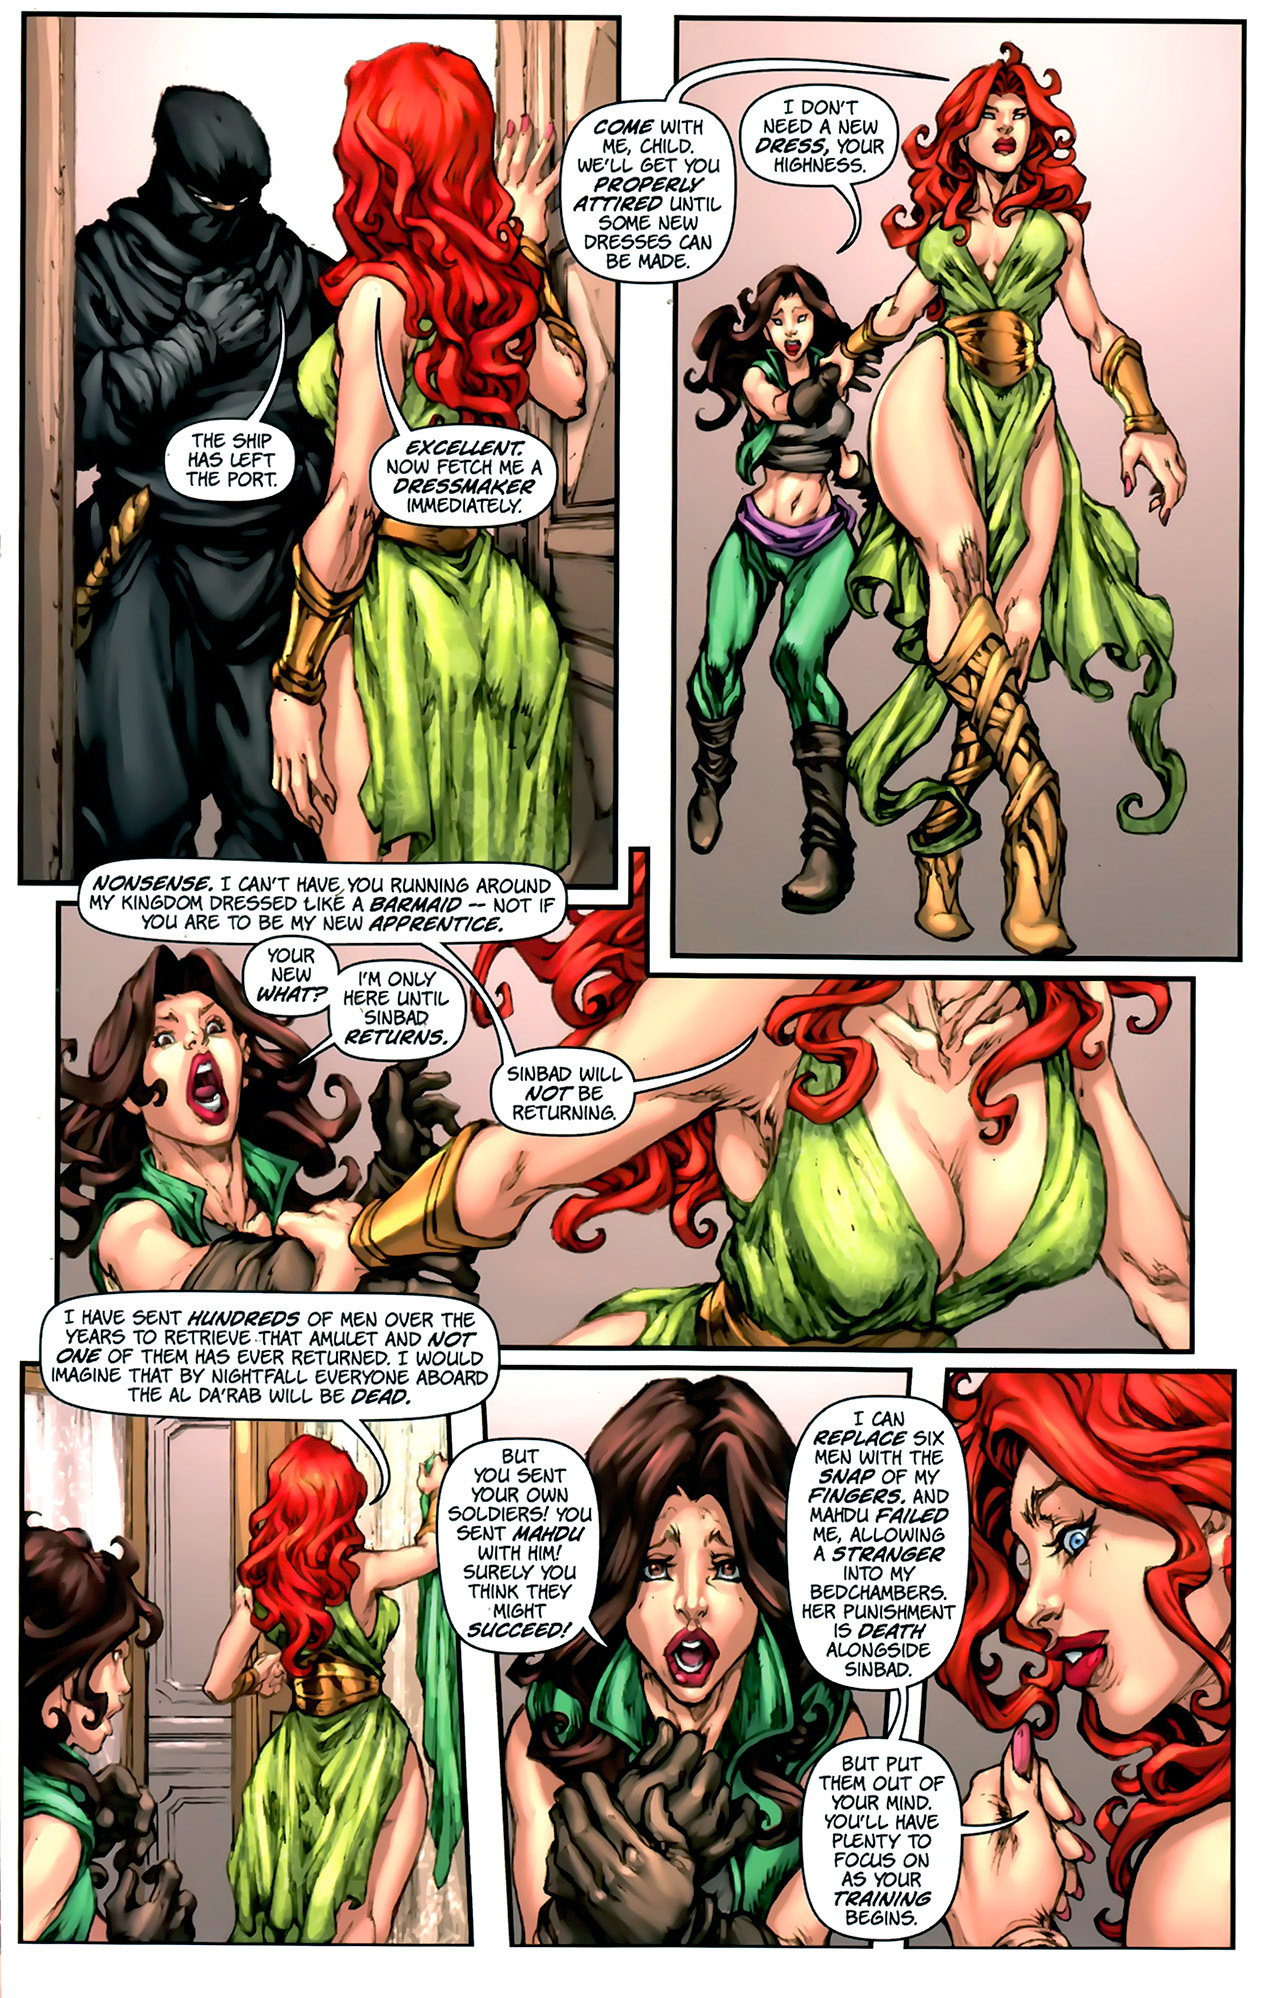 Read online 1001 Arabian Nights: The Adventures of Sinbad comic -  Issue #2 - 20